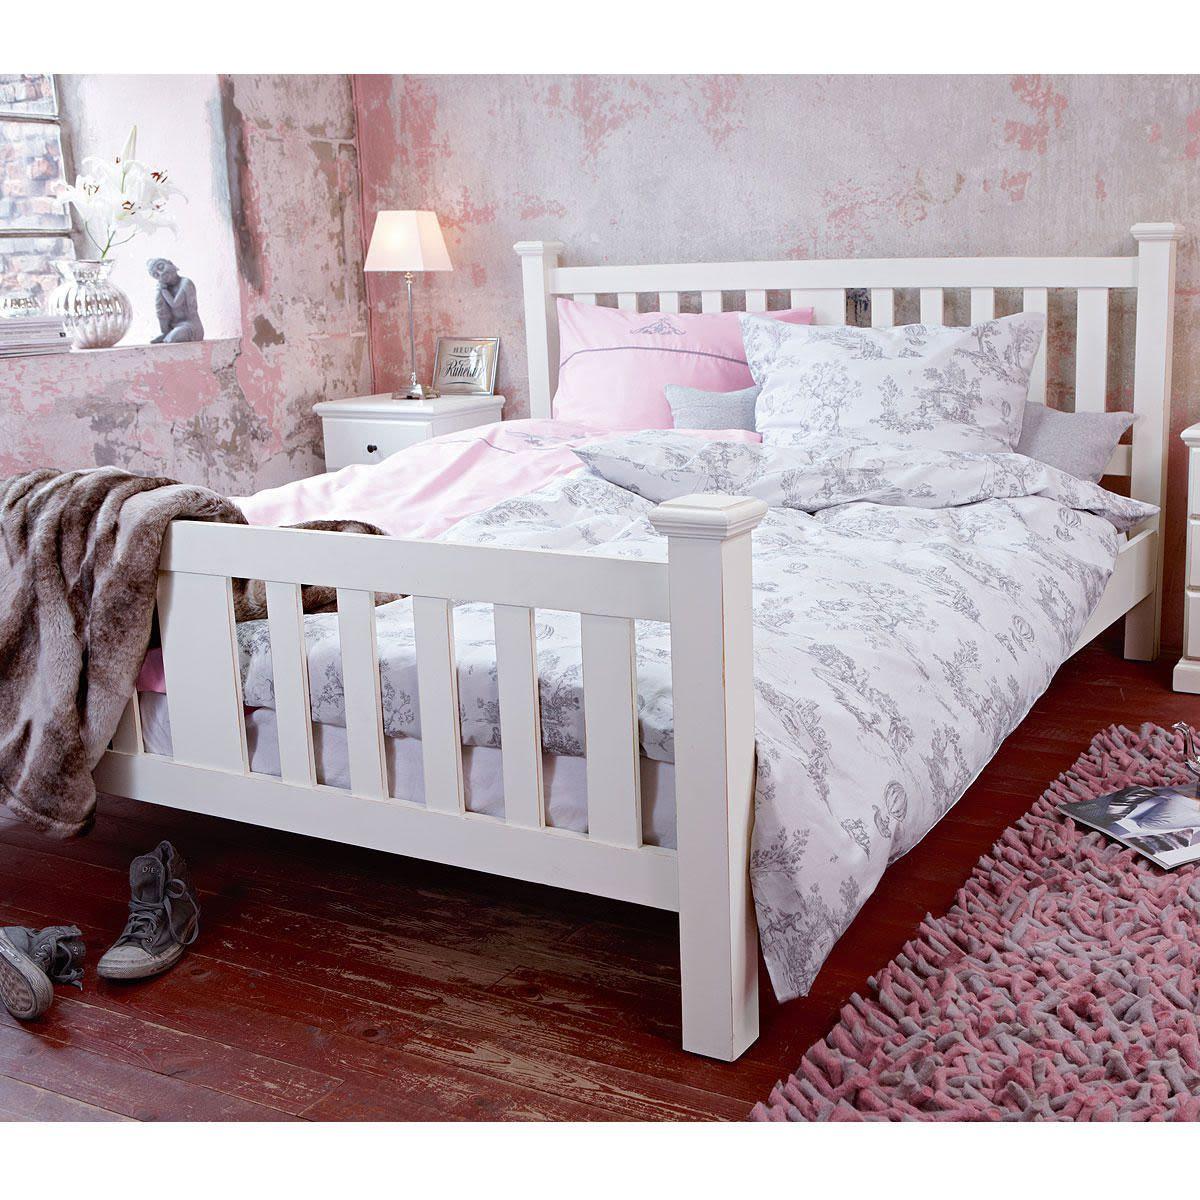 schlafzimmer braun. Black Bedroom Furniture Sets. Home Design Ideas